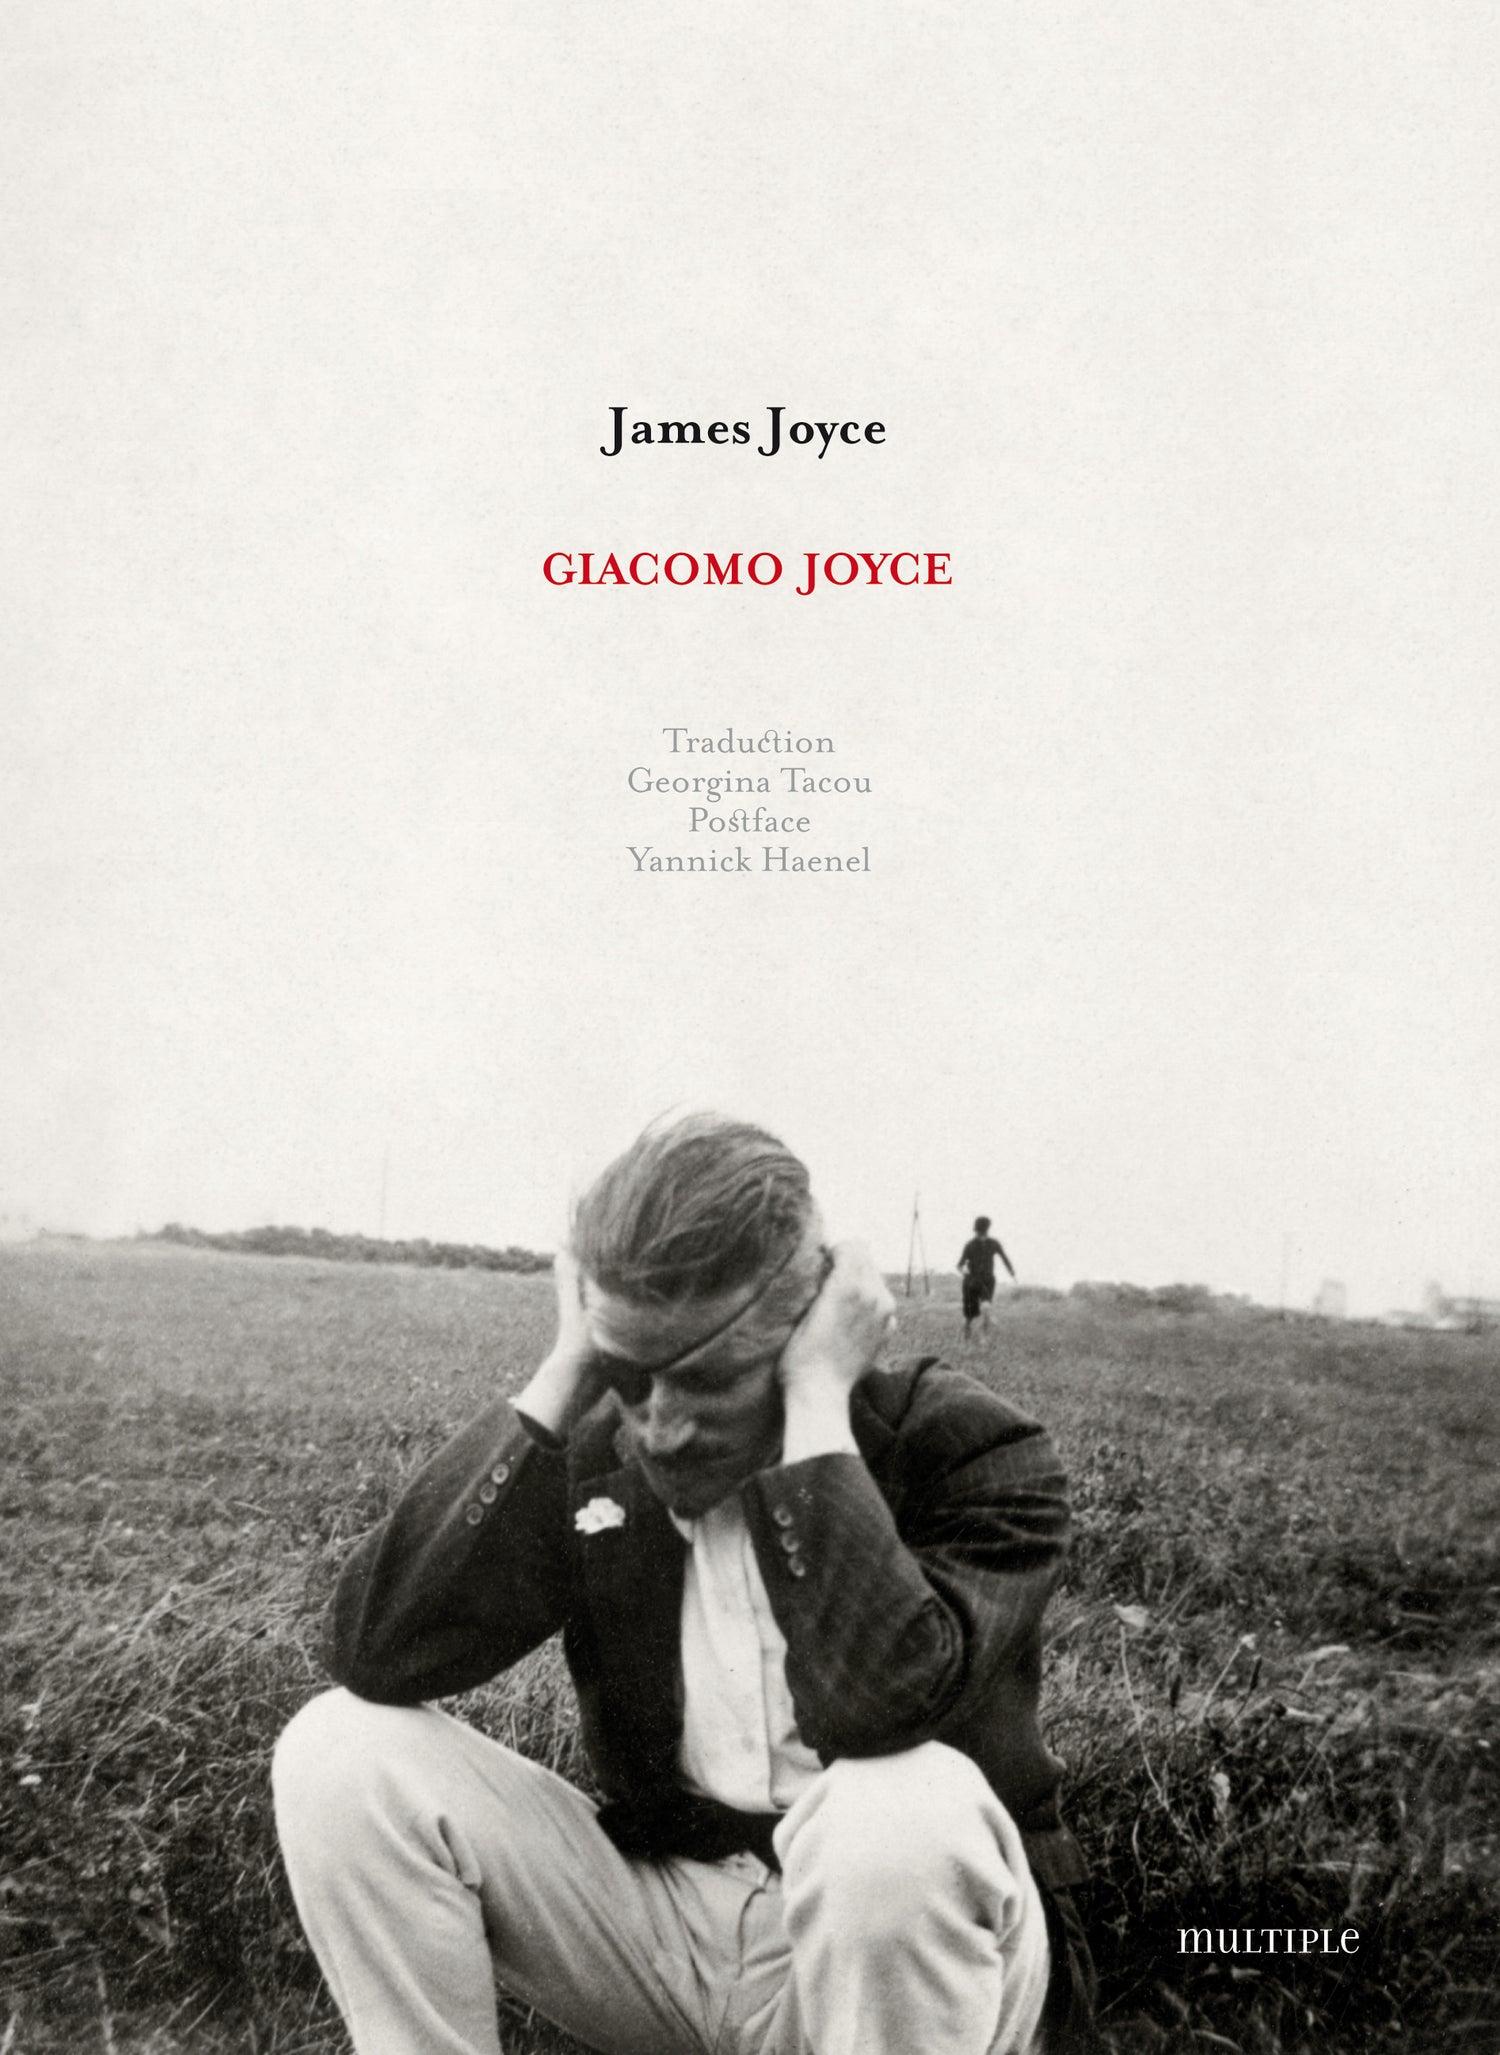 Image of James Joyce